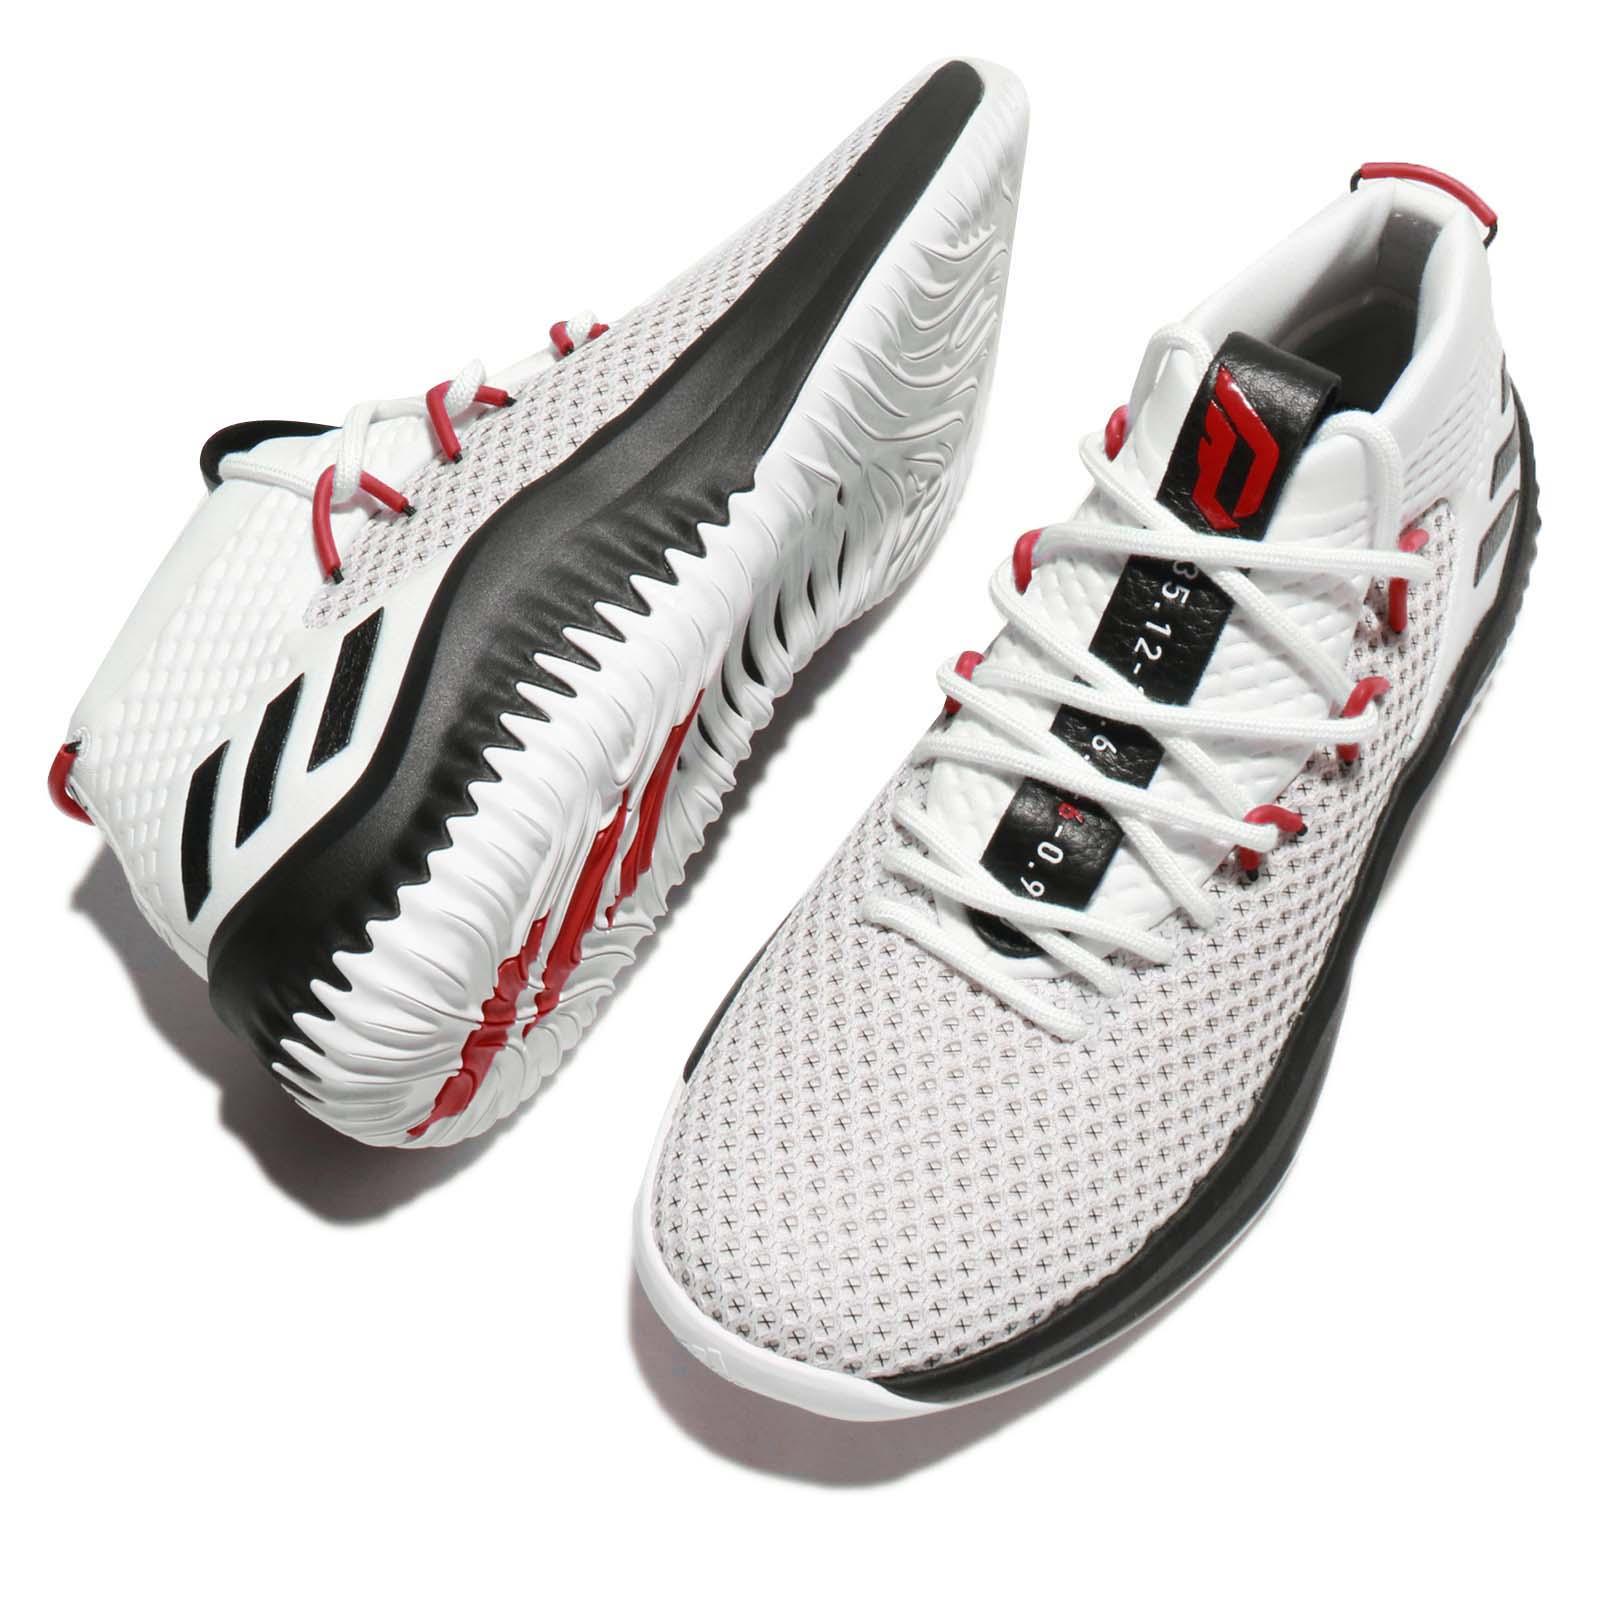 wholesale dealer 60e62 c08bf adidas Dame 4 Damian Lillard Rip City Home Trail Blazers Whi